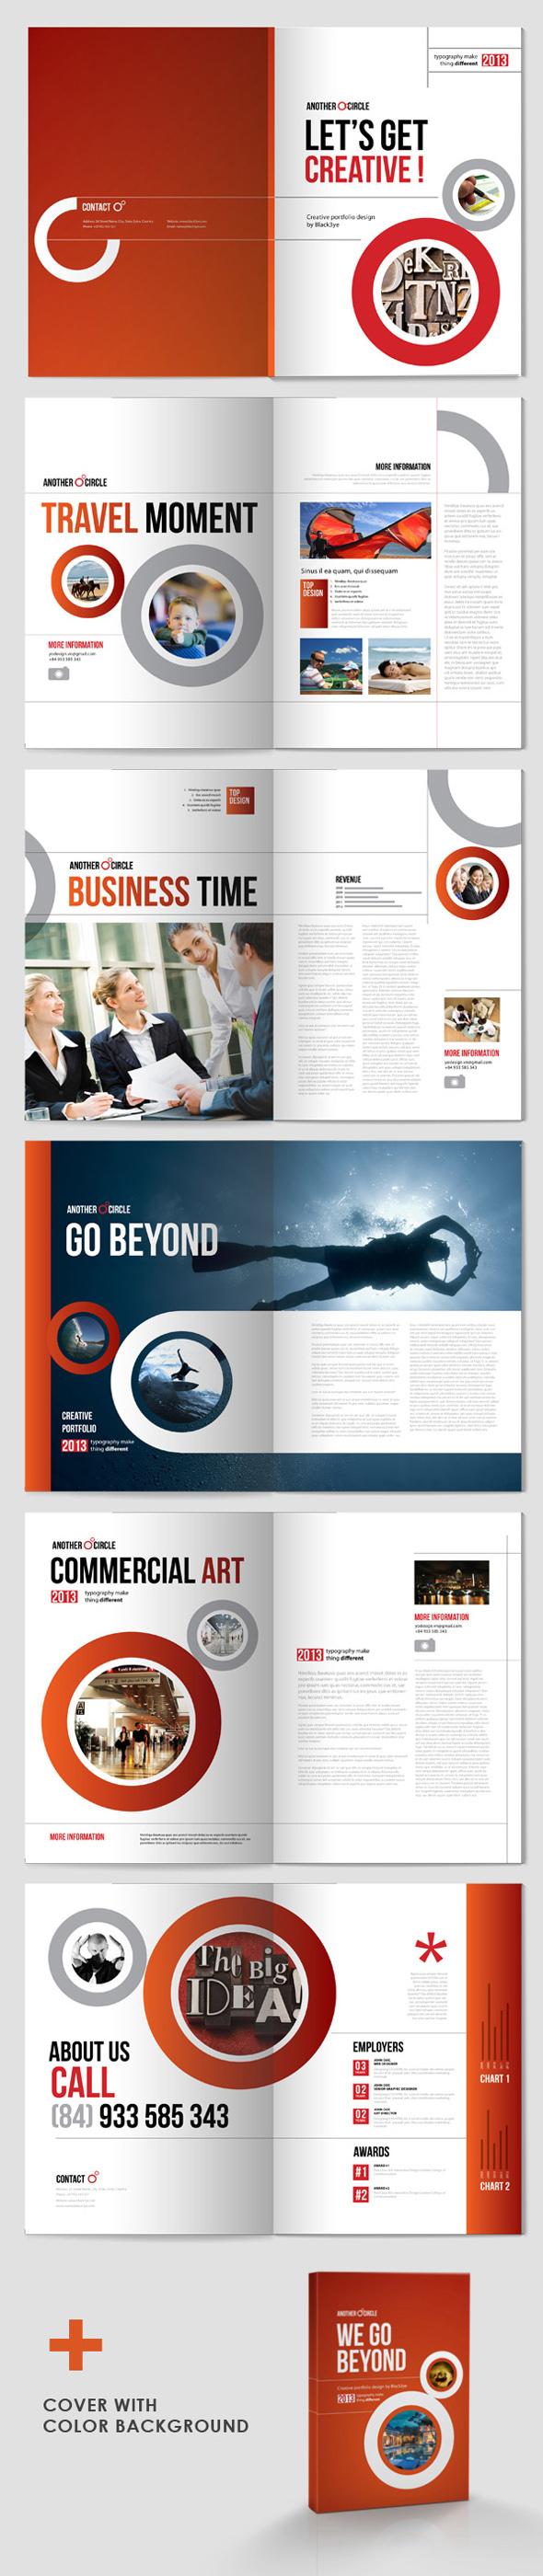 Brosur Perusahaan - Another Cirle Brochure 1